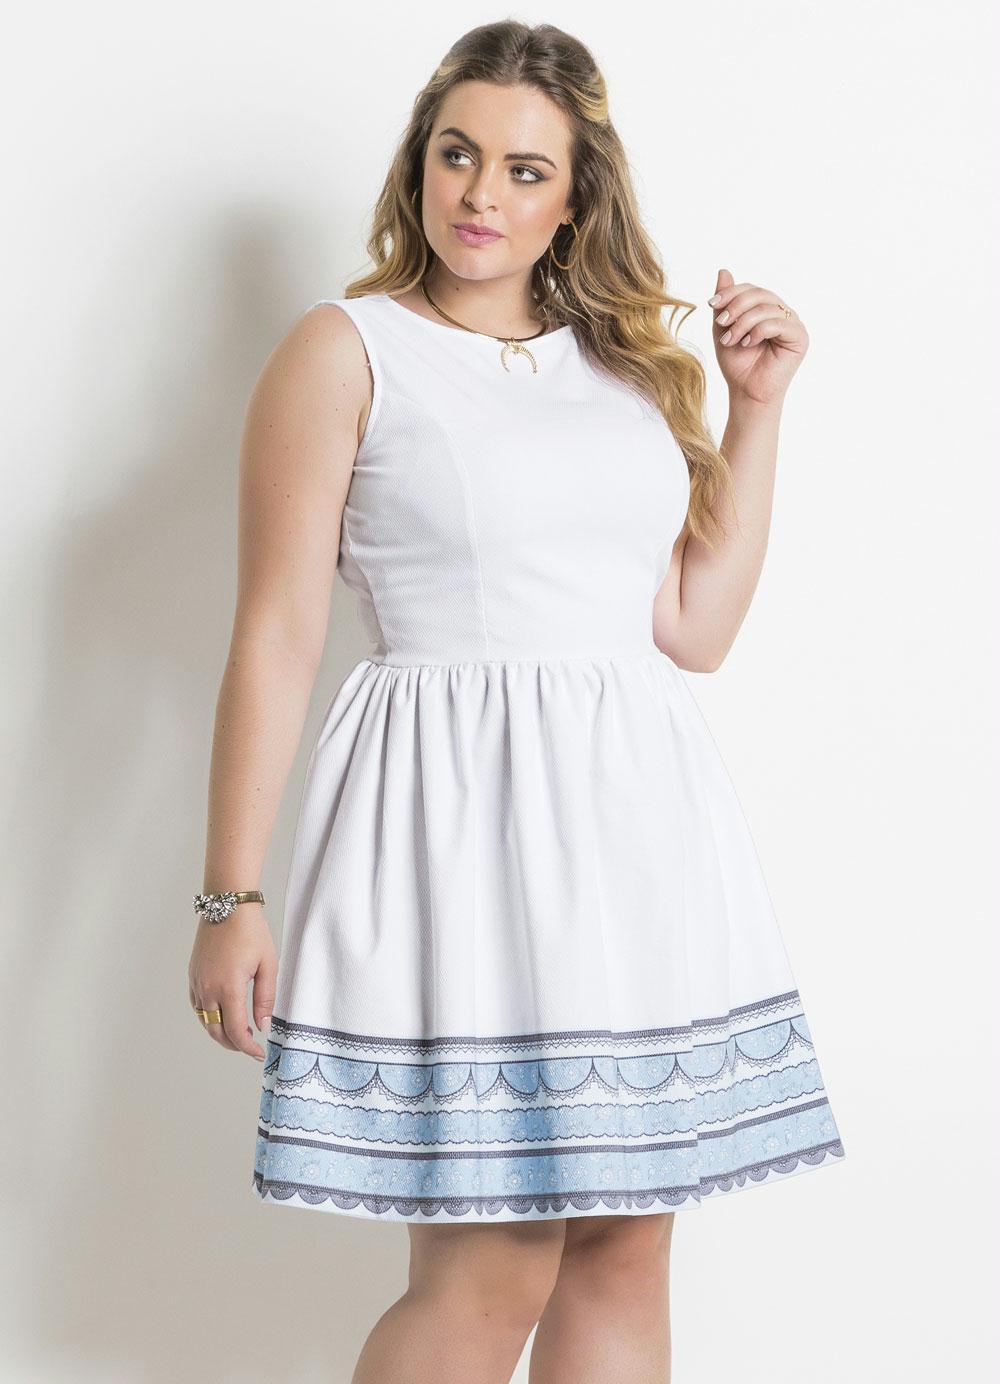 21109ddccd24e7 Vestido Quintess (Branco e Azul) Evasê Plus Size